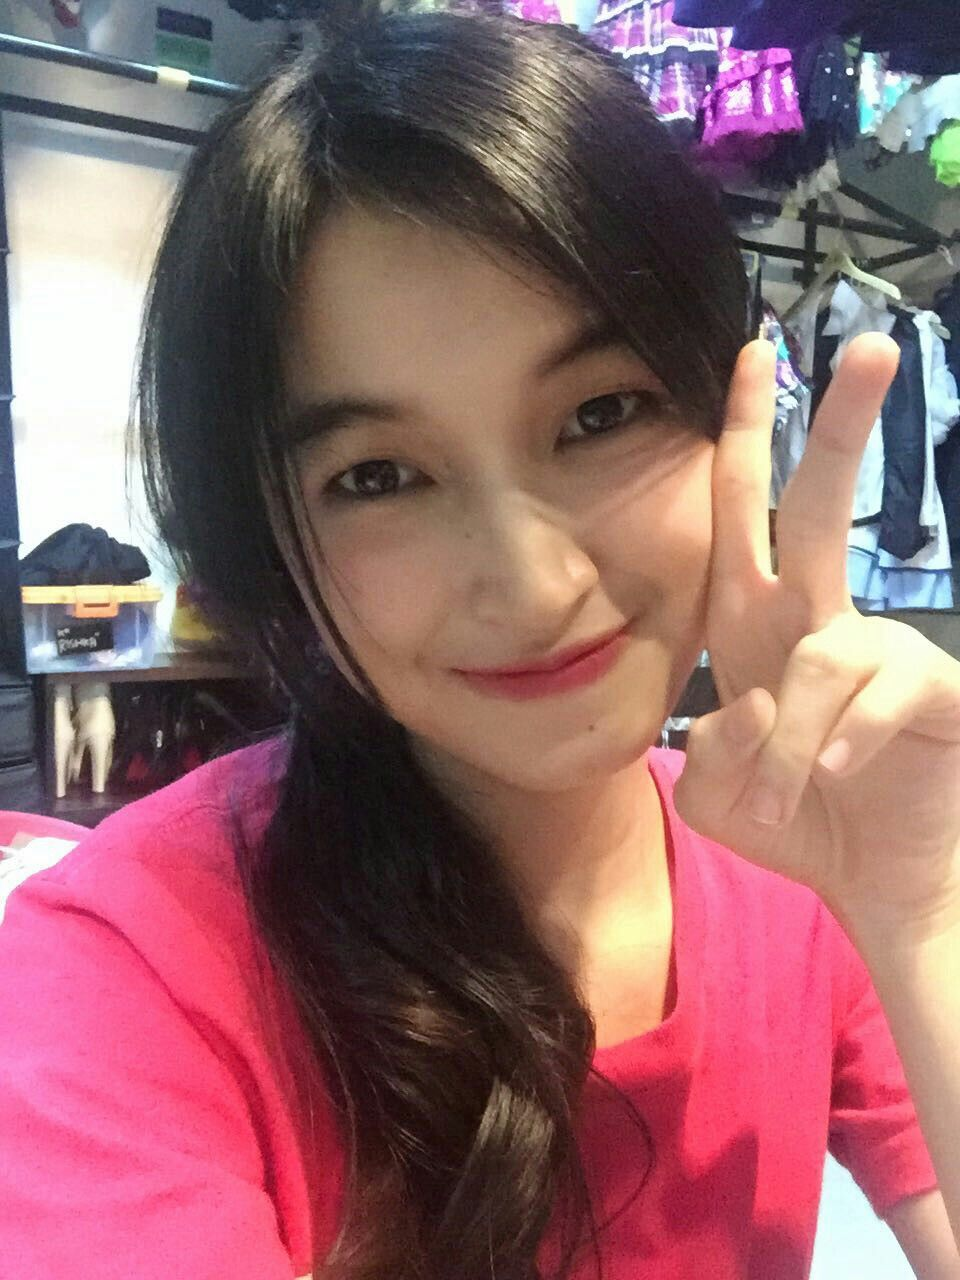 Pin oleh JKT48 di Citra Ayu Pranajaya Artis, Hiburan